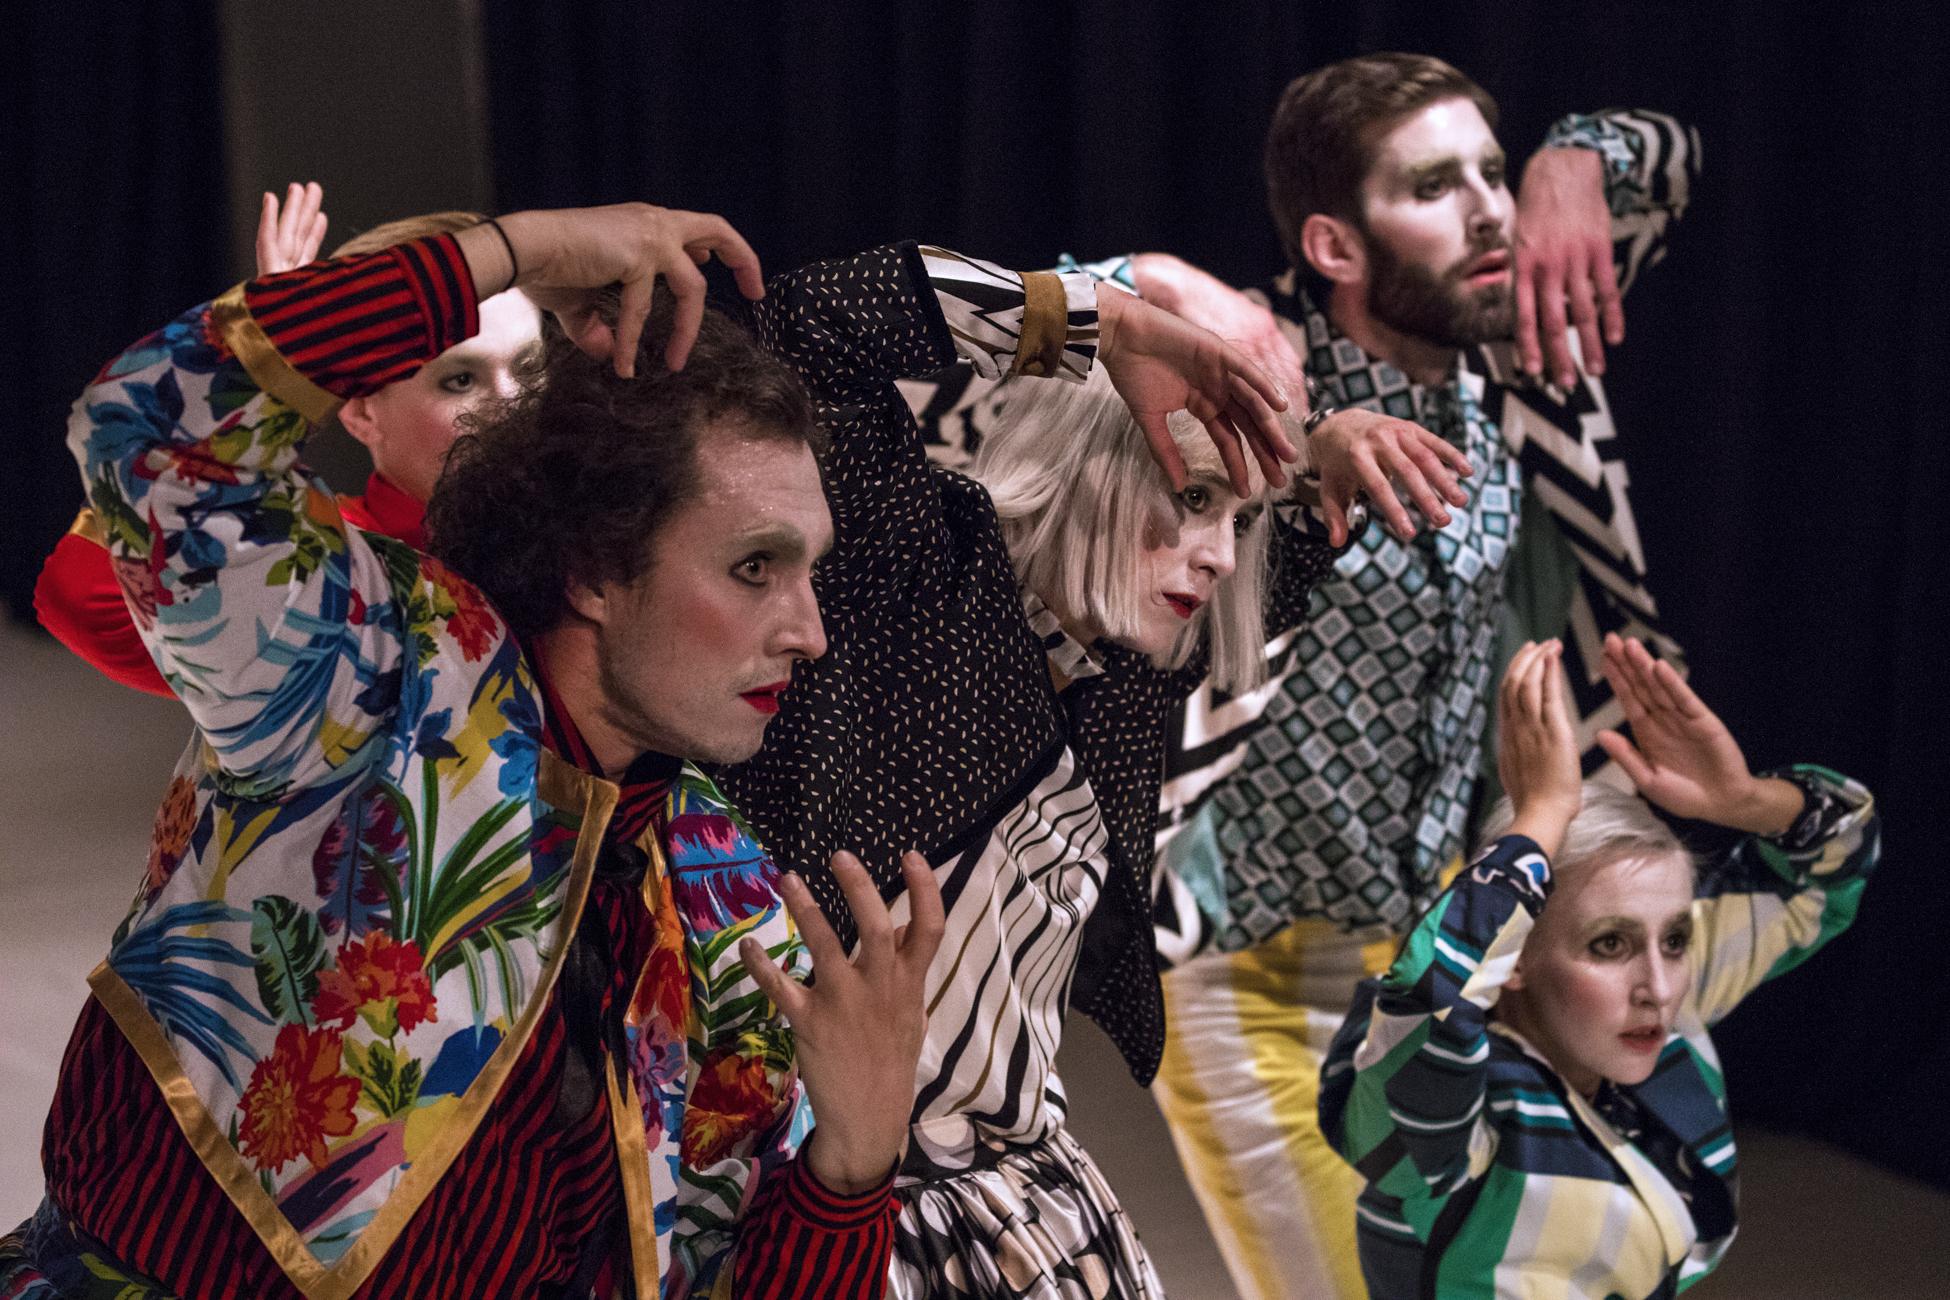 Premijera predstave 'Staging a Play: Tartuffe' u Svetvinčentu